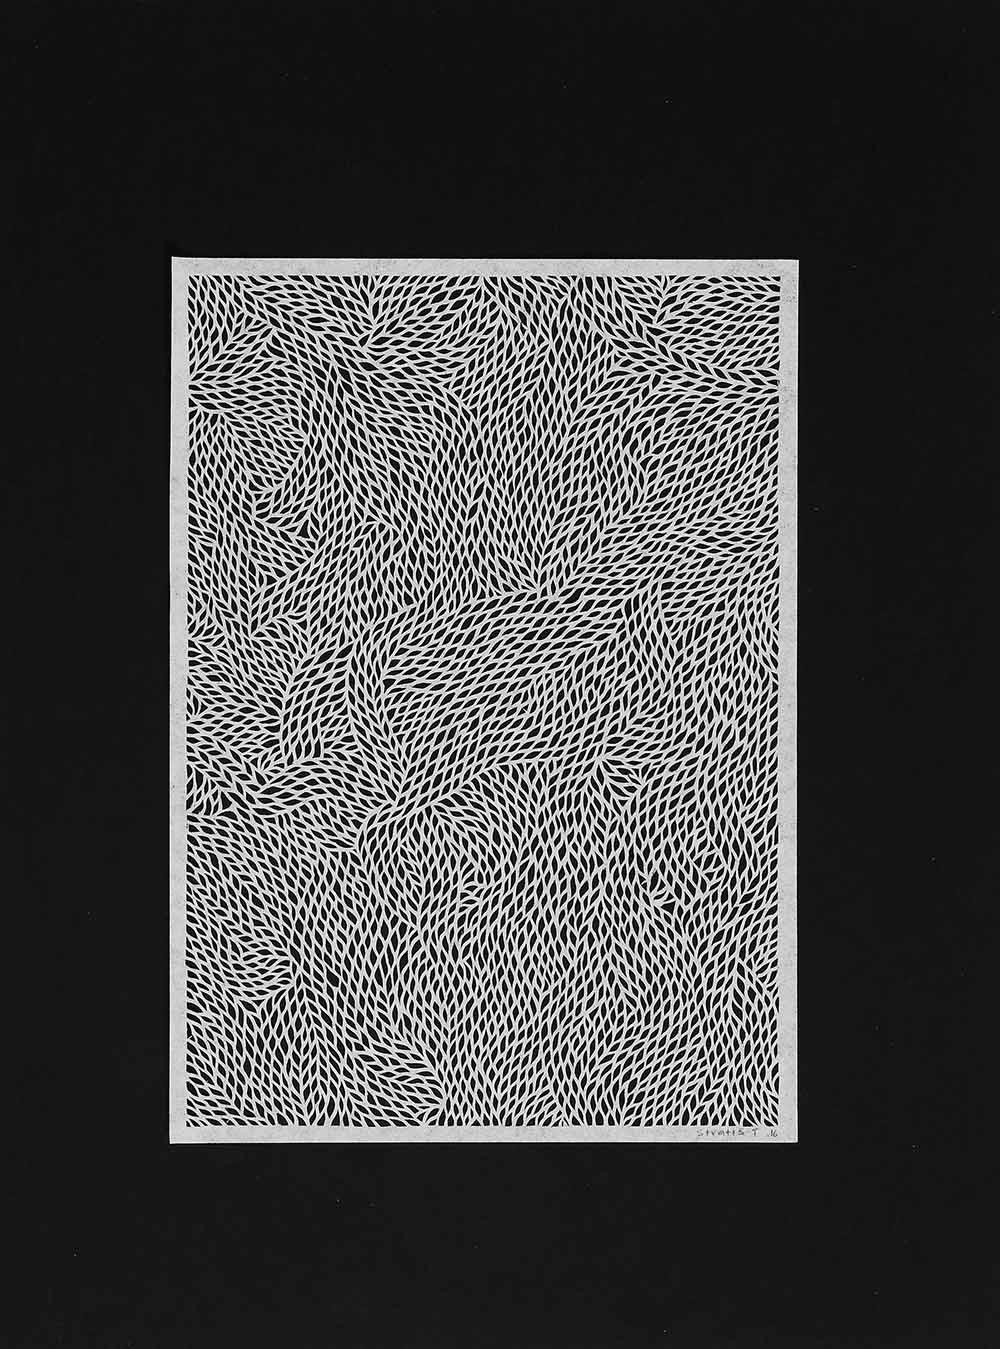 Untitled White Threads